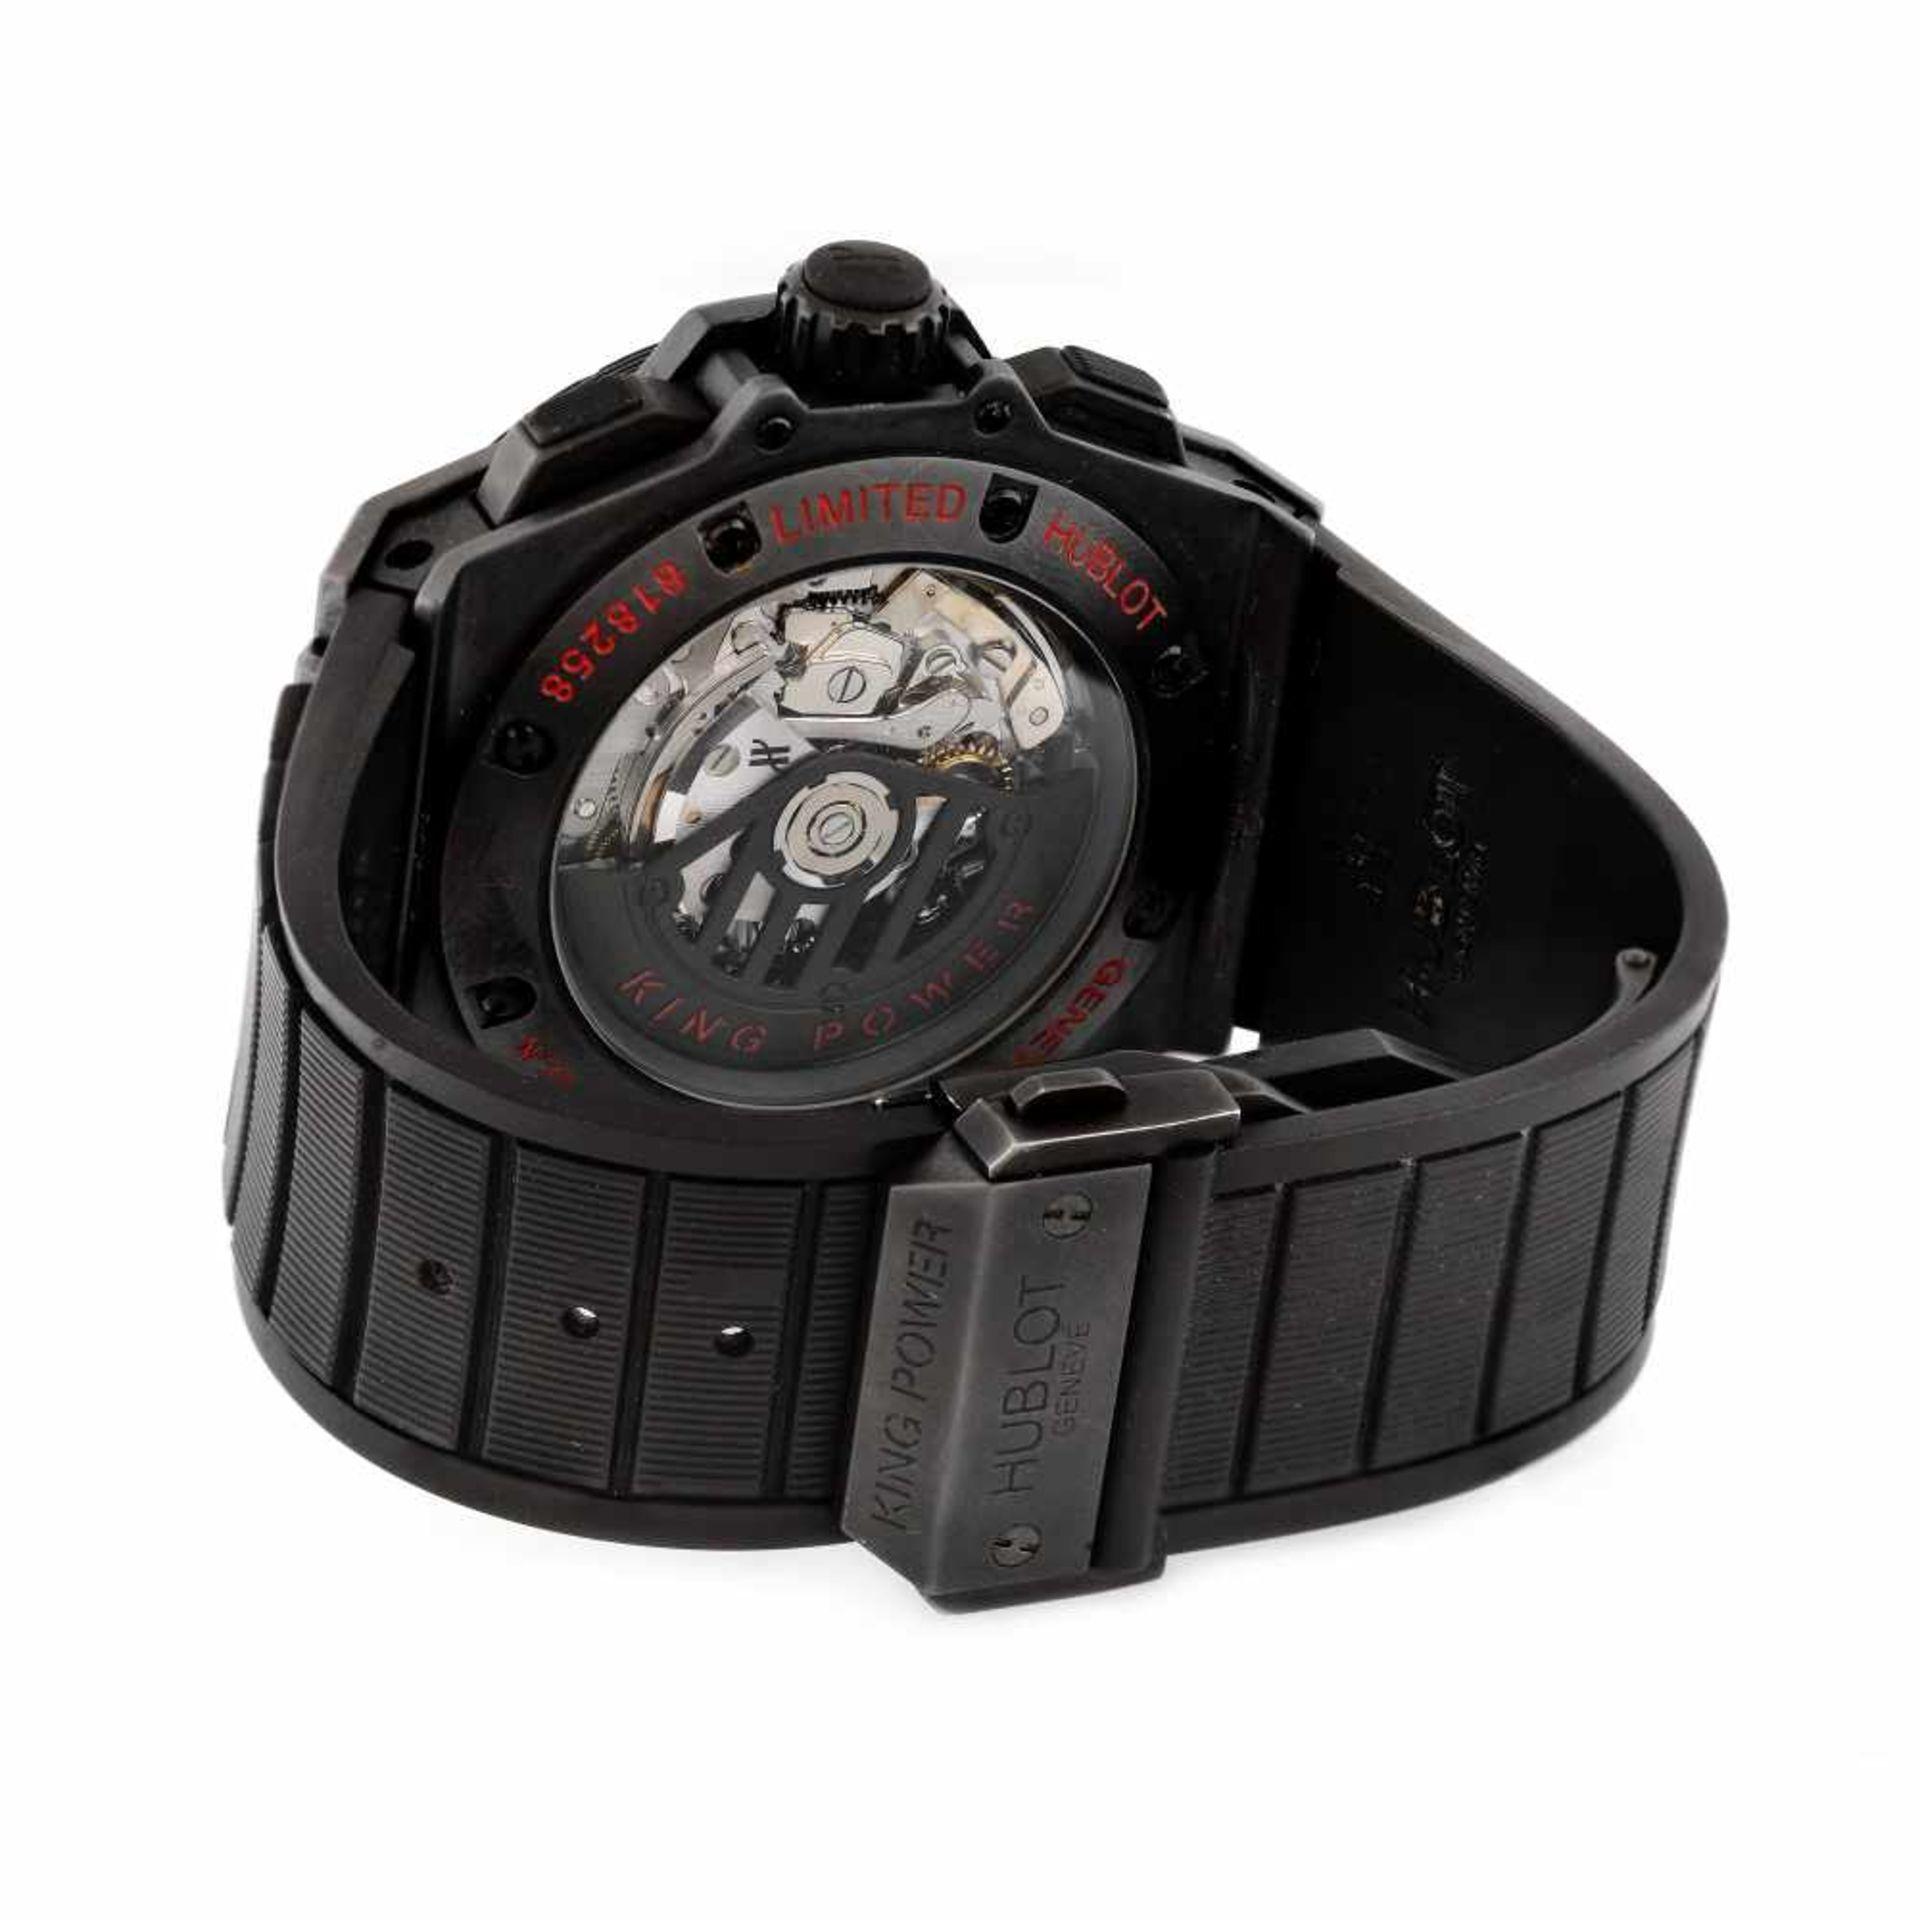 Hublot King Power wristwatch, ceramic, men, limited edition 301/500, provenance documents - Bild 3 aus 4